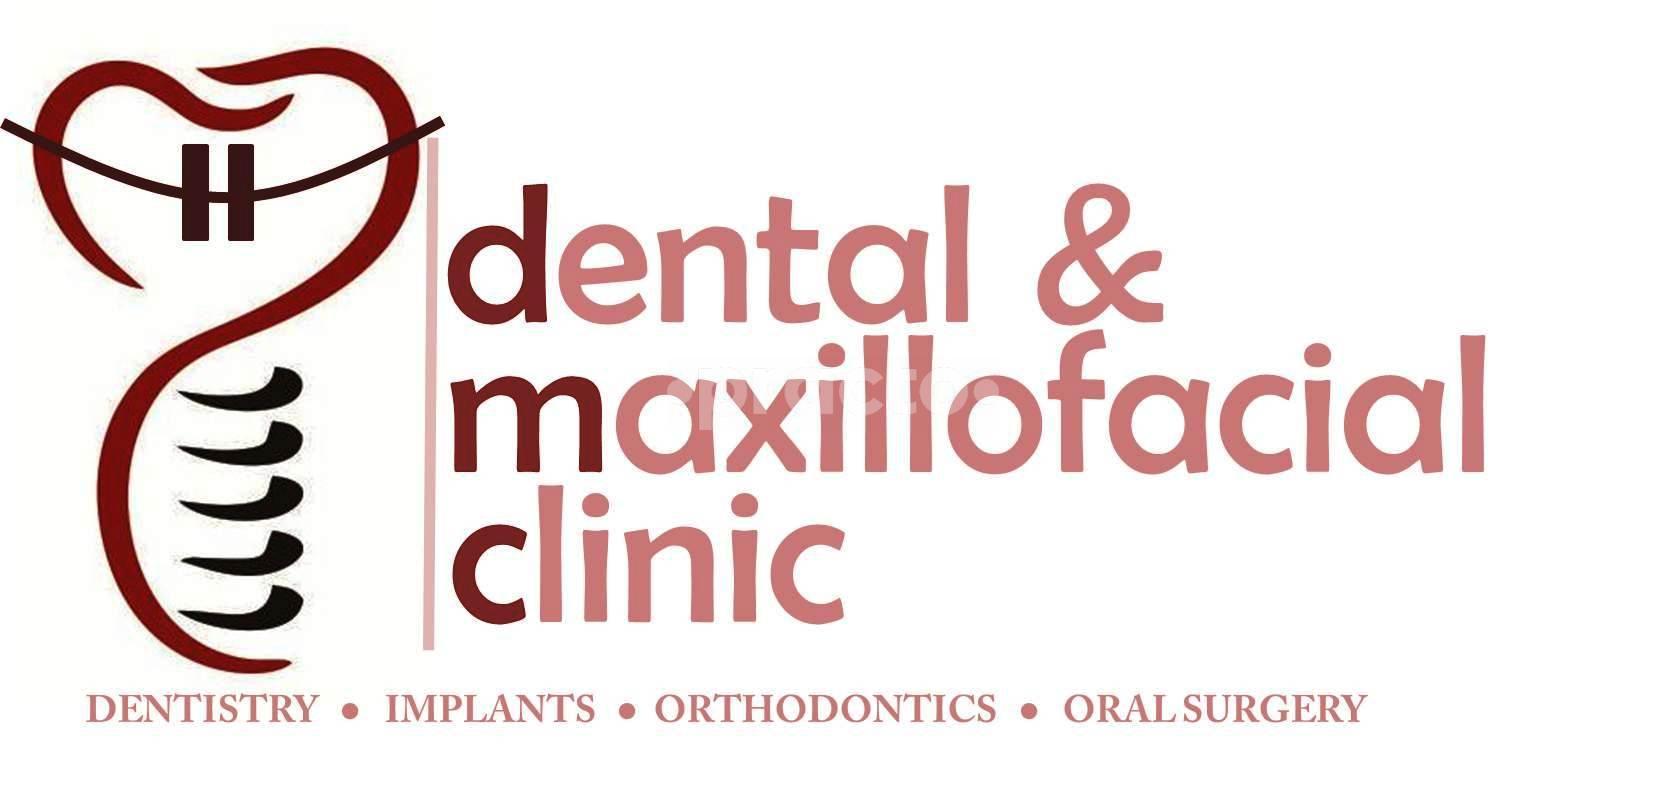 Dental & Maxillofacial Clinic